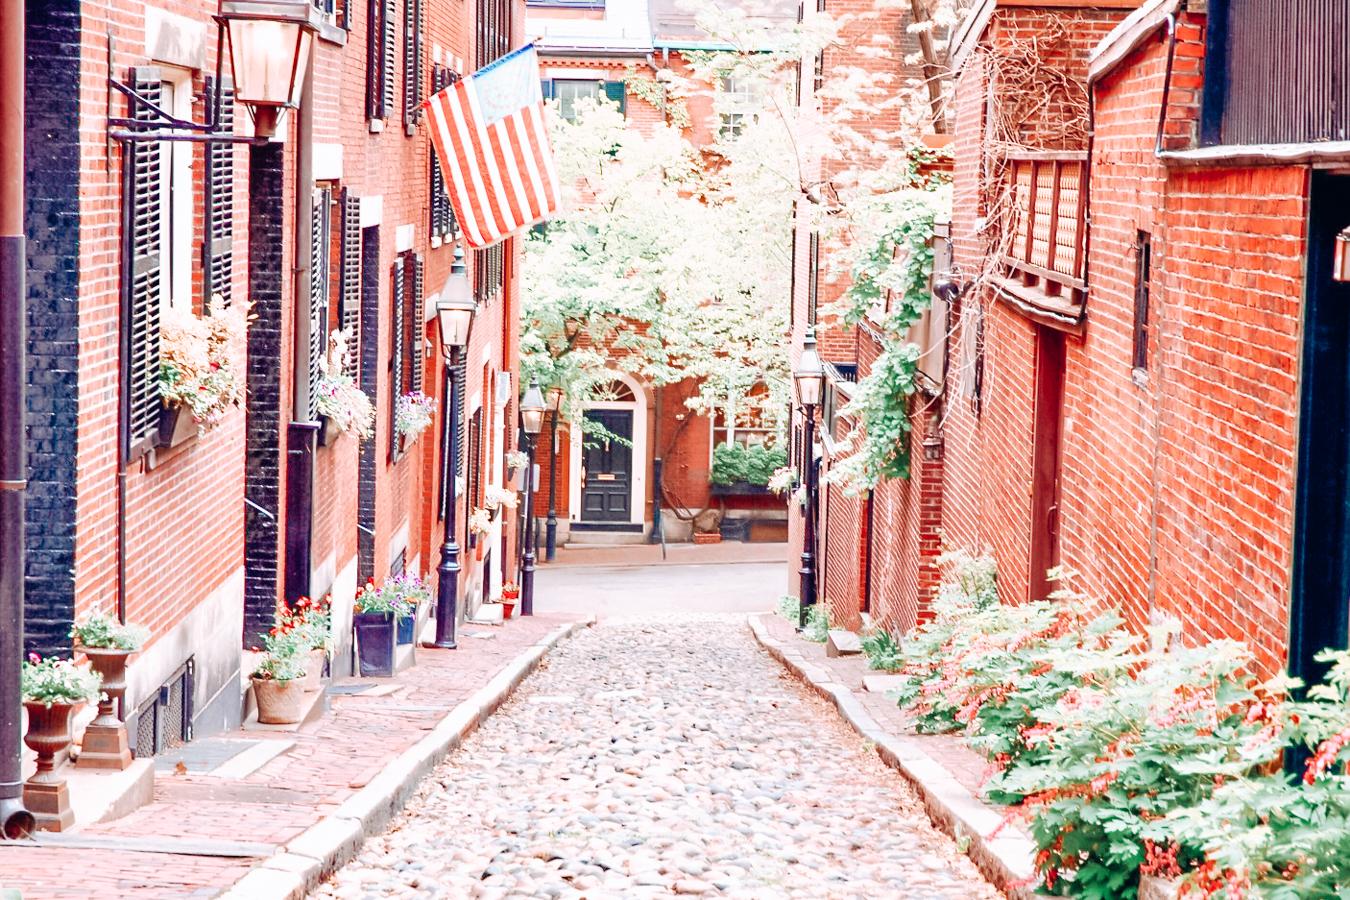 Instagrammable view of Acorn Street in Boston